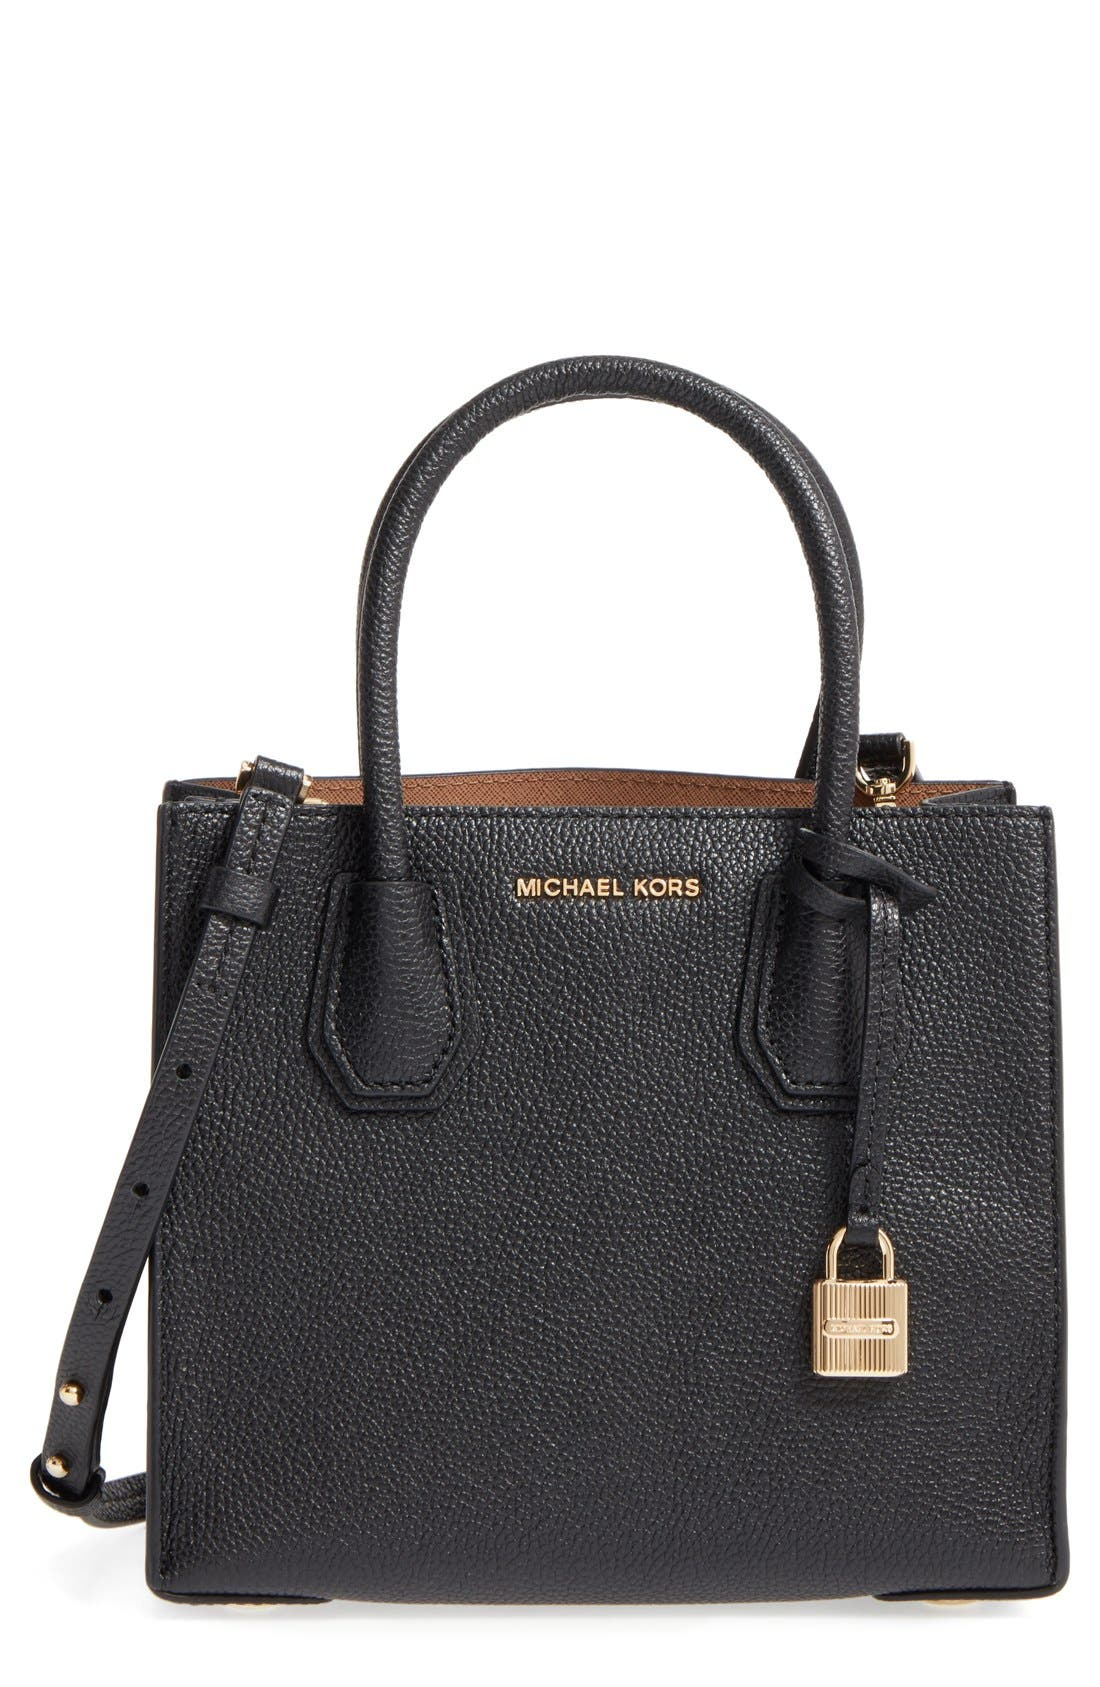 Mercer Leather Crossbody Bag,                             Main thumbnail 1, color,                             Black/ Gold